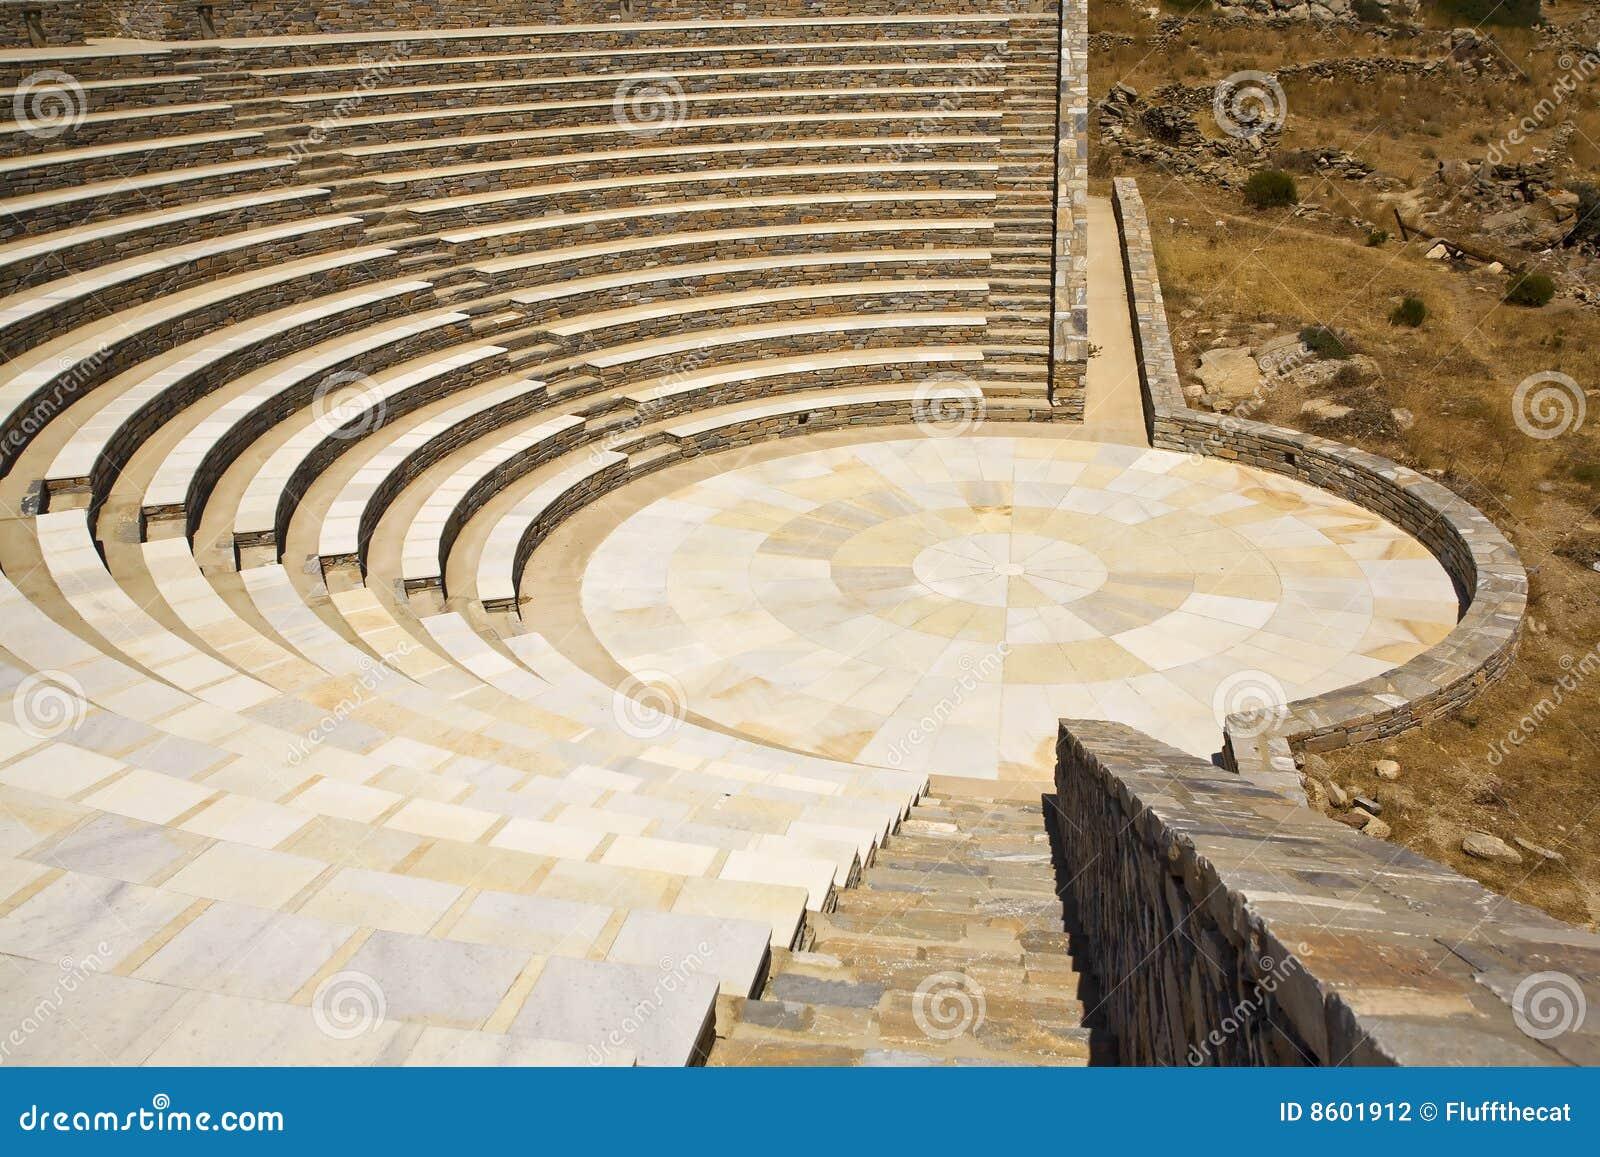 Ancient Greek Amphitheater, Greece Stock Photography - Image: 8601912 Empty Brick Wall